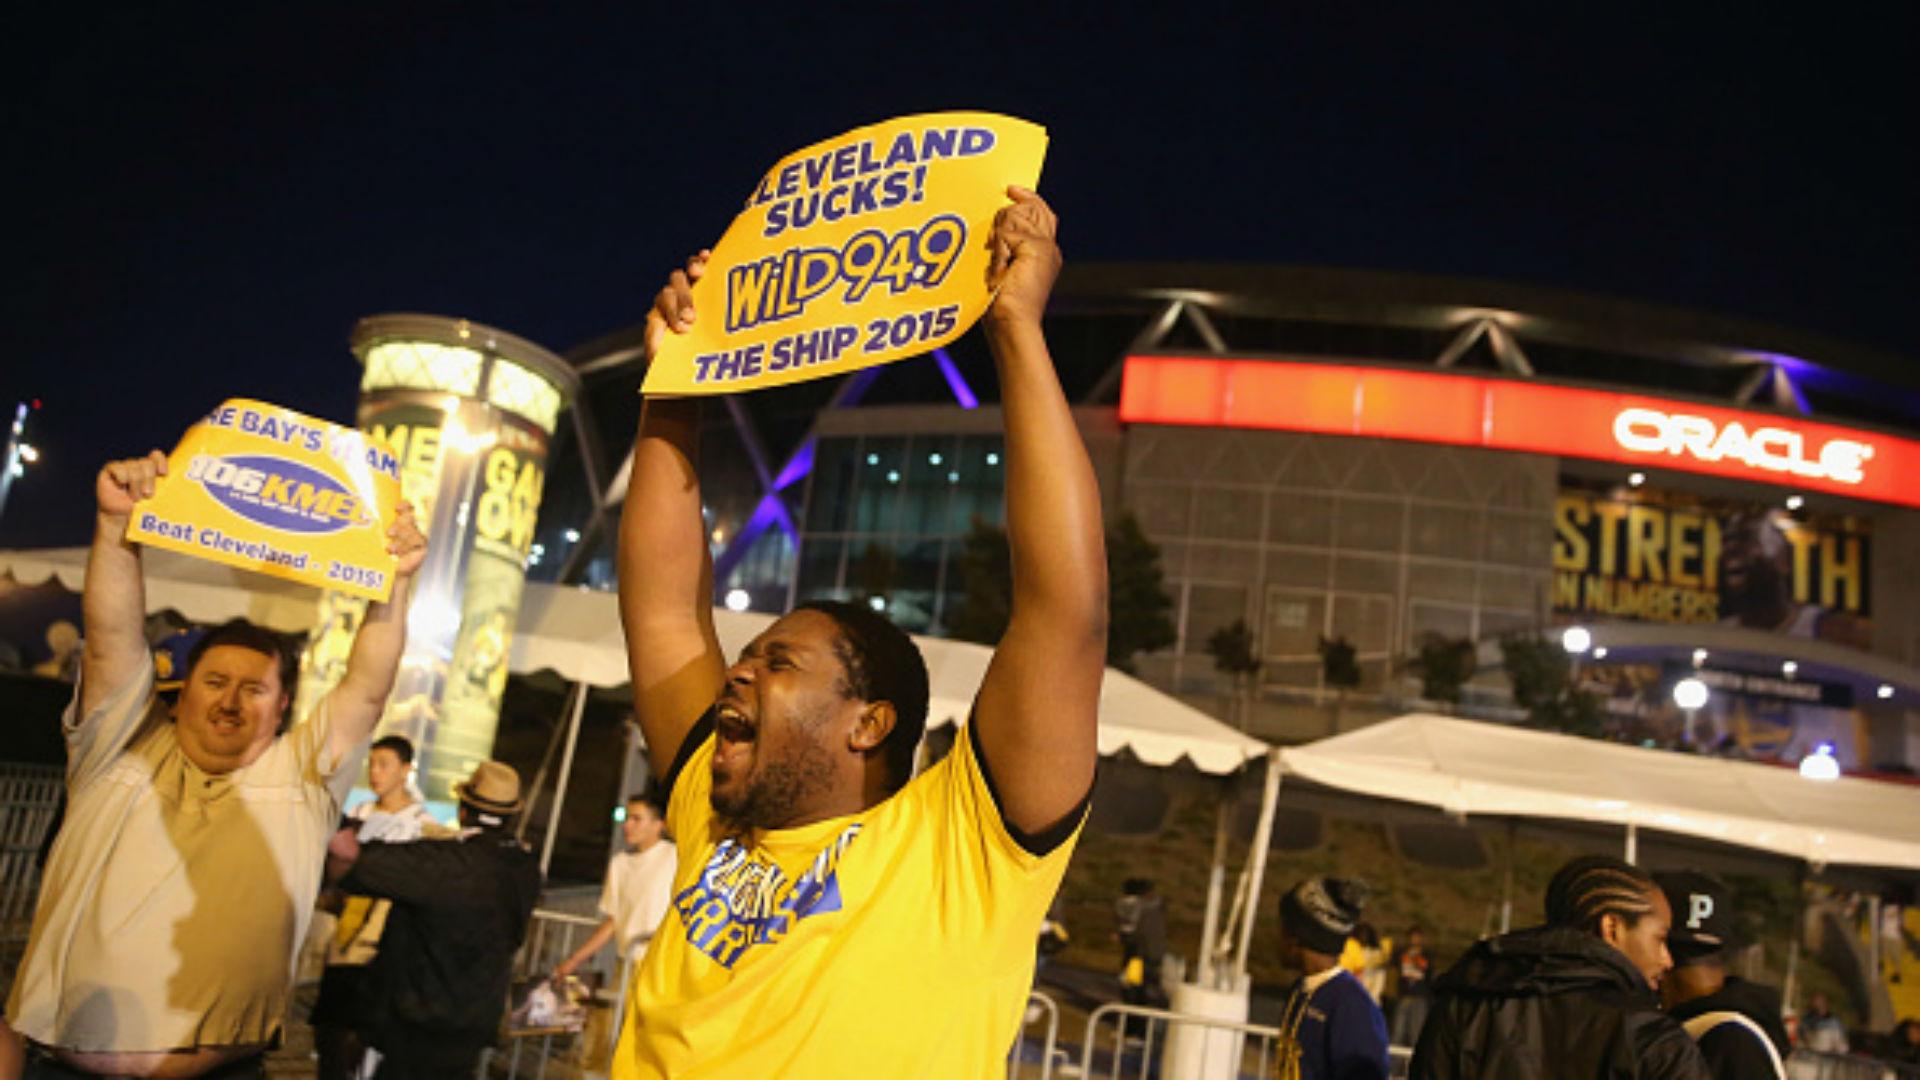 Warriors fans-06172015-Getty Images-FTR.jpg